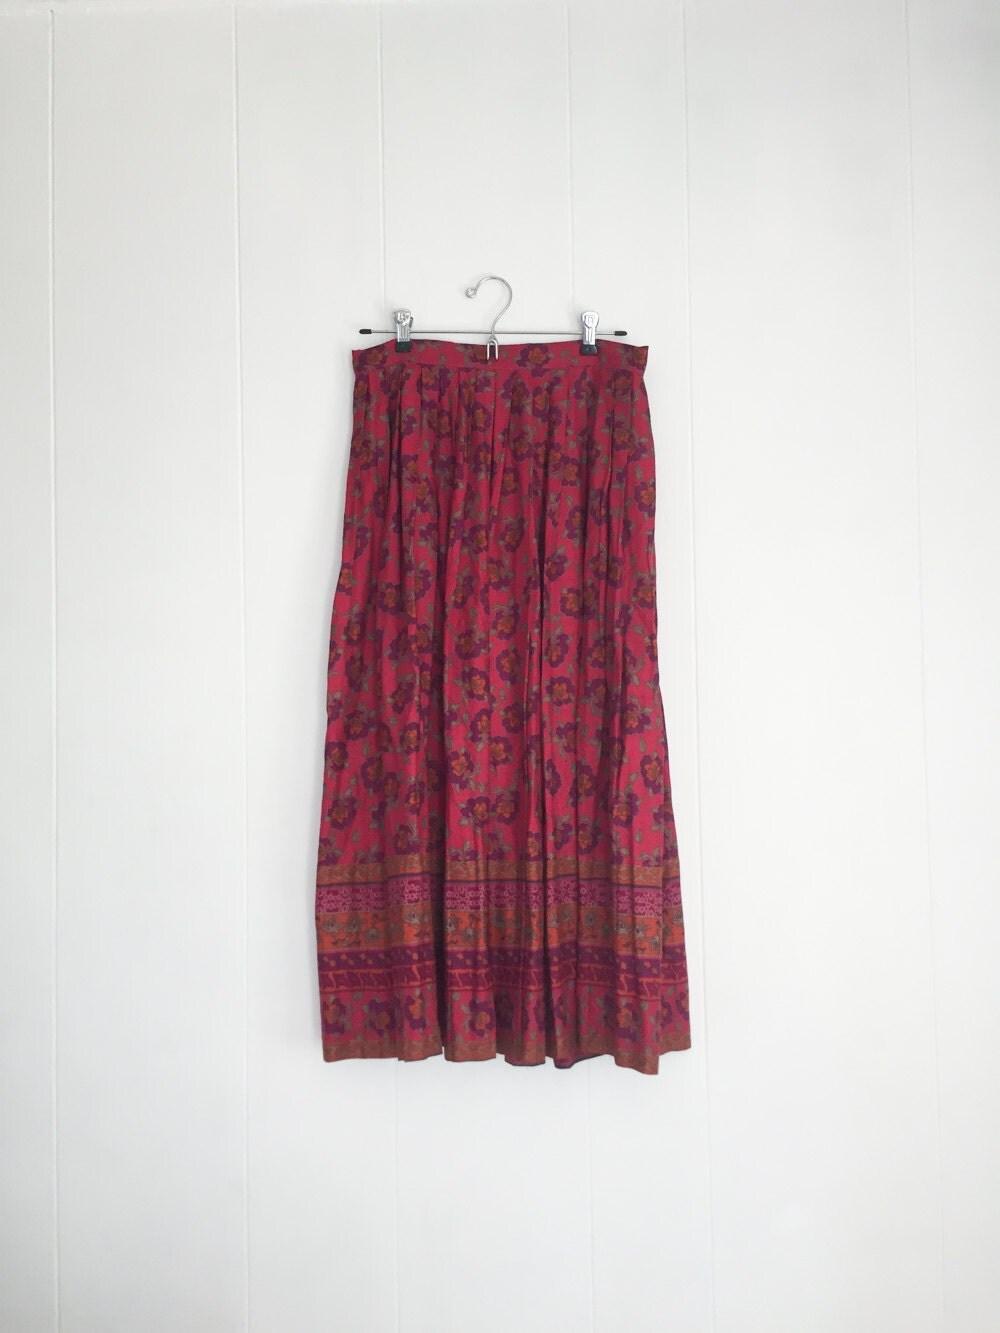 boho skirt gypsie skirt flowy 90s skirt vintage